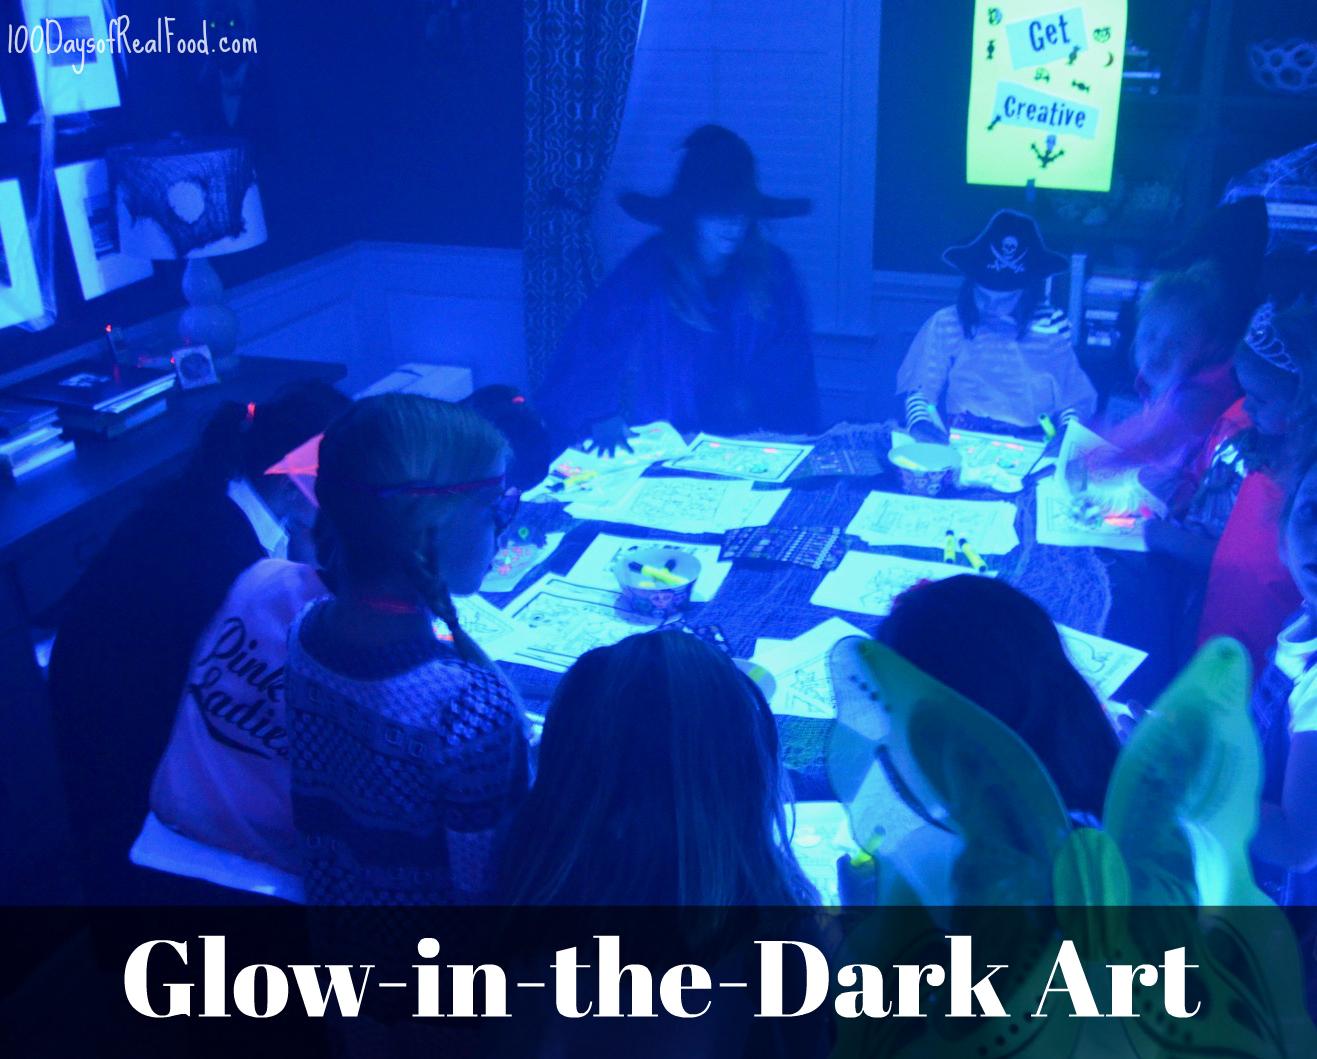 Glow in the dark art